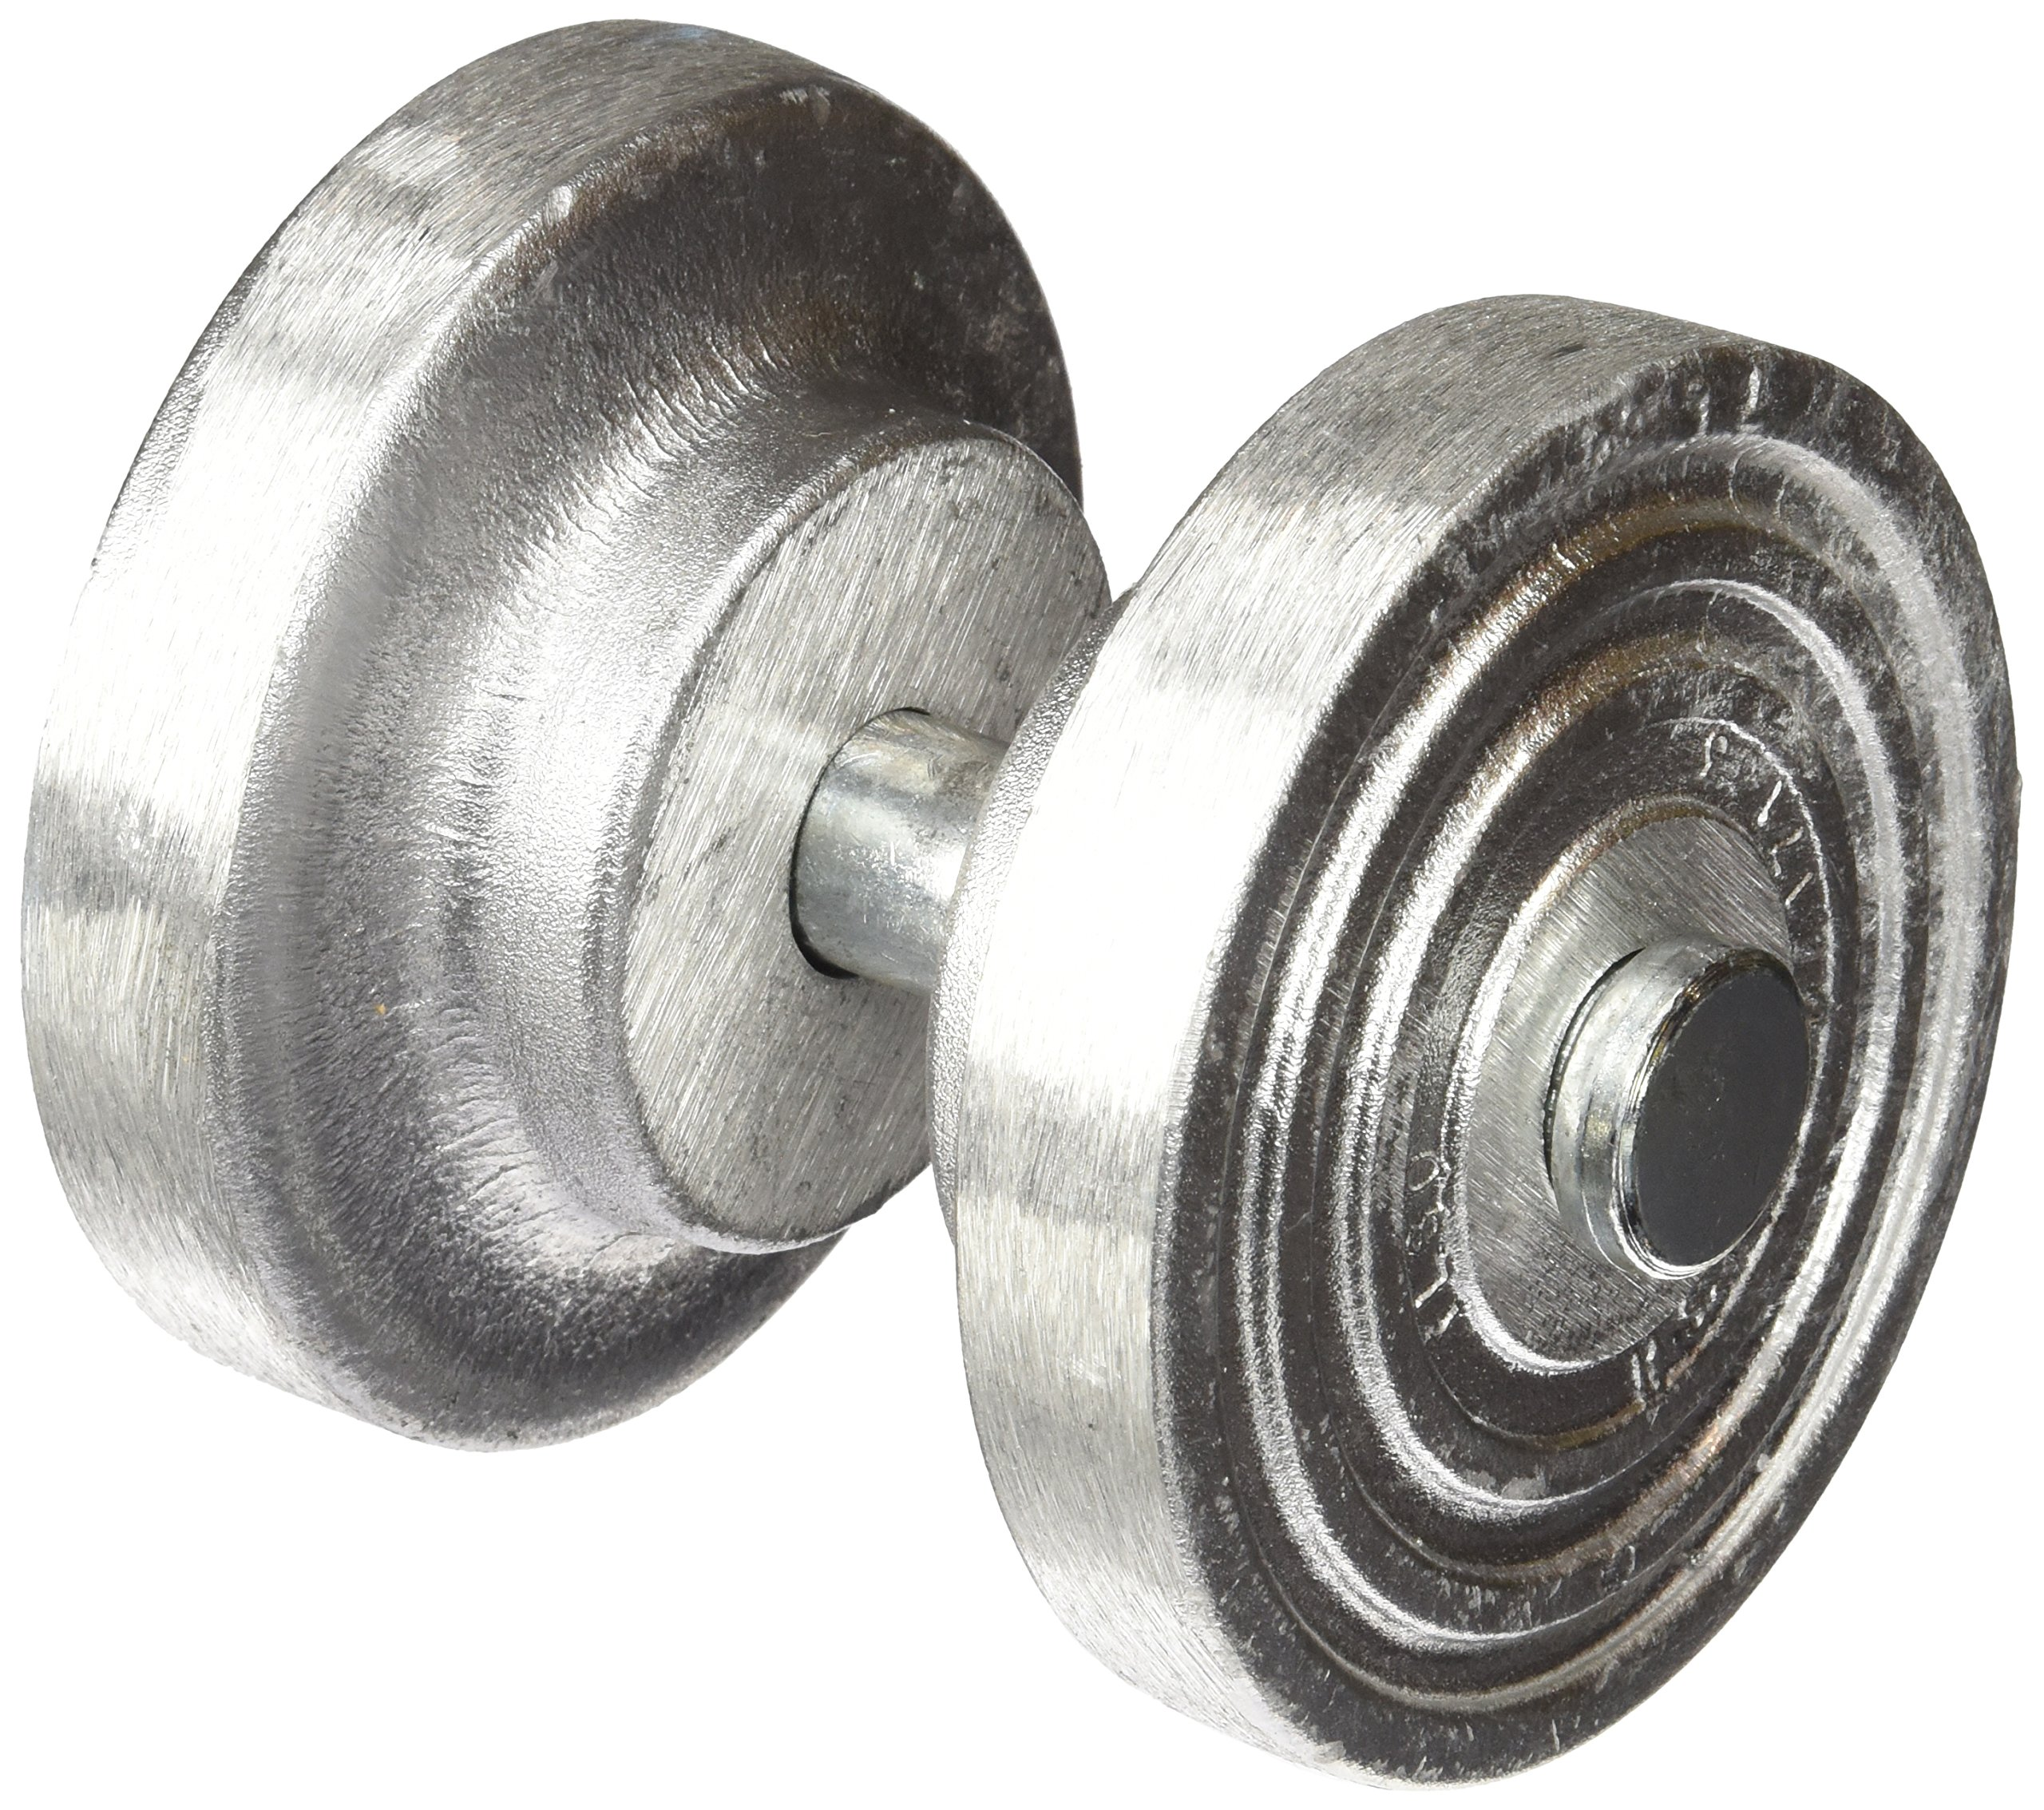 Blaylock TL-60 Pintle, Lunette and Drawbar Lock by Blaylock American Metal